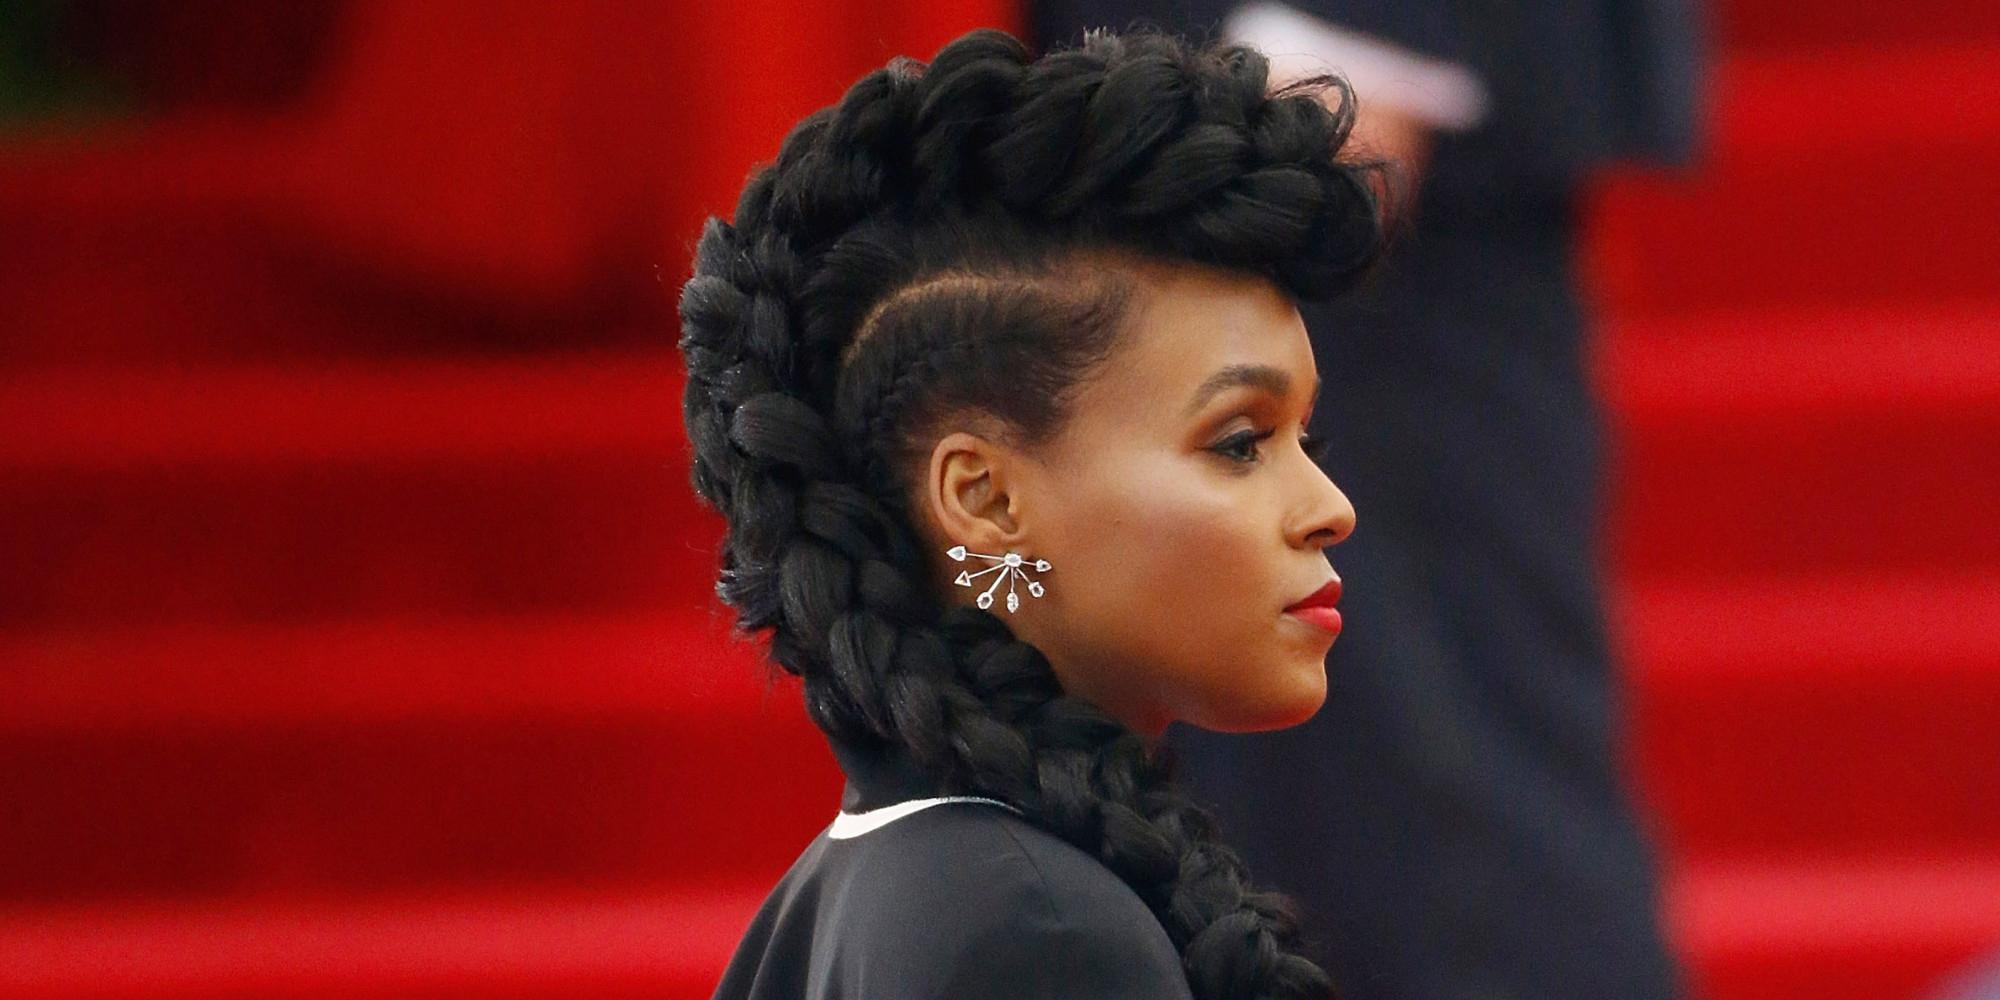 40 Mohawk Hairstyles For Black Omen Regarding Most Popular Black Mohawk Hairstyles (View 8 of 20)